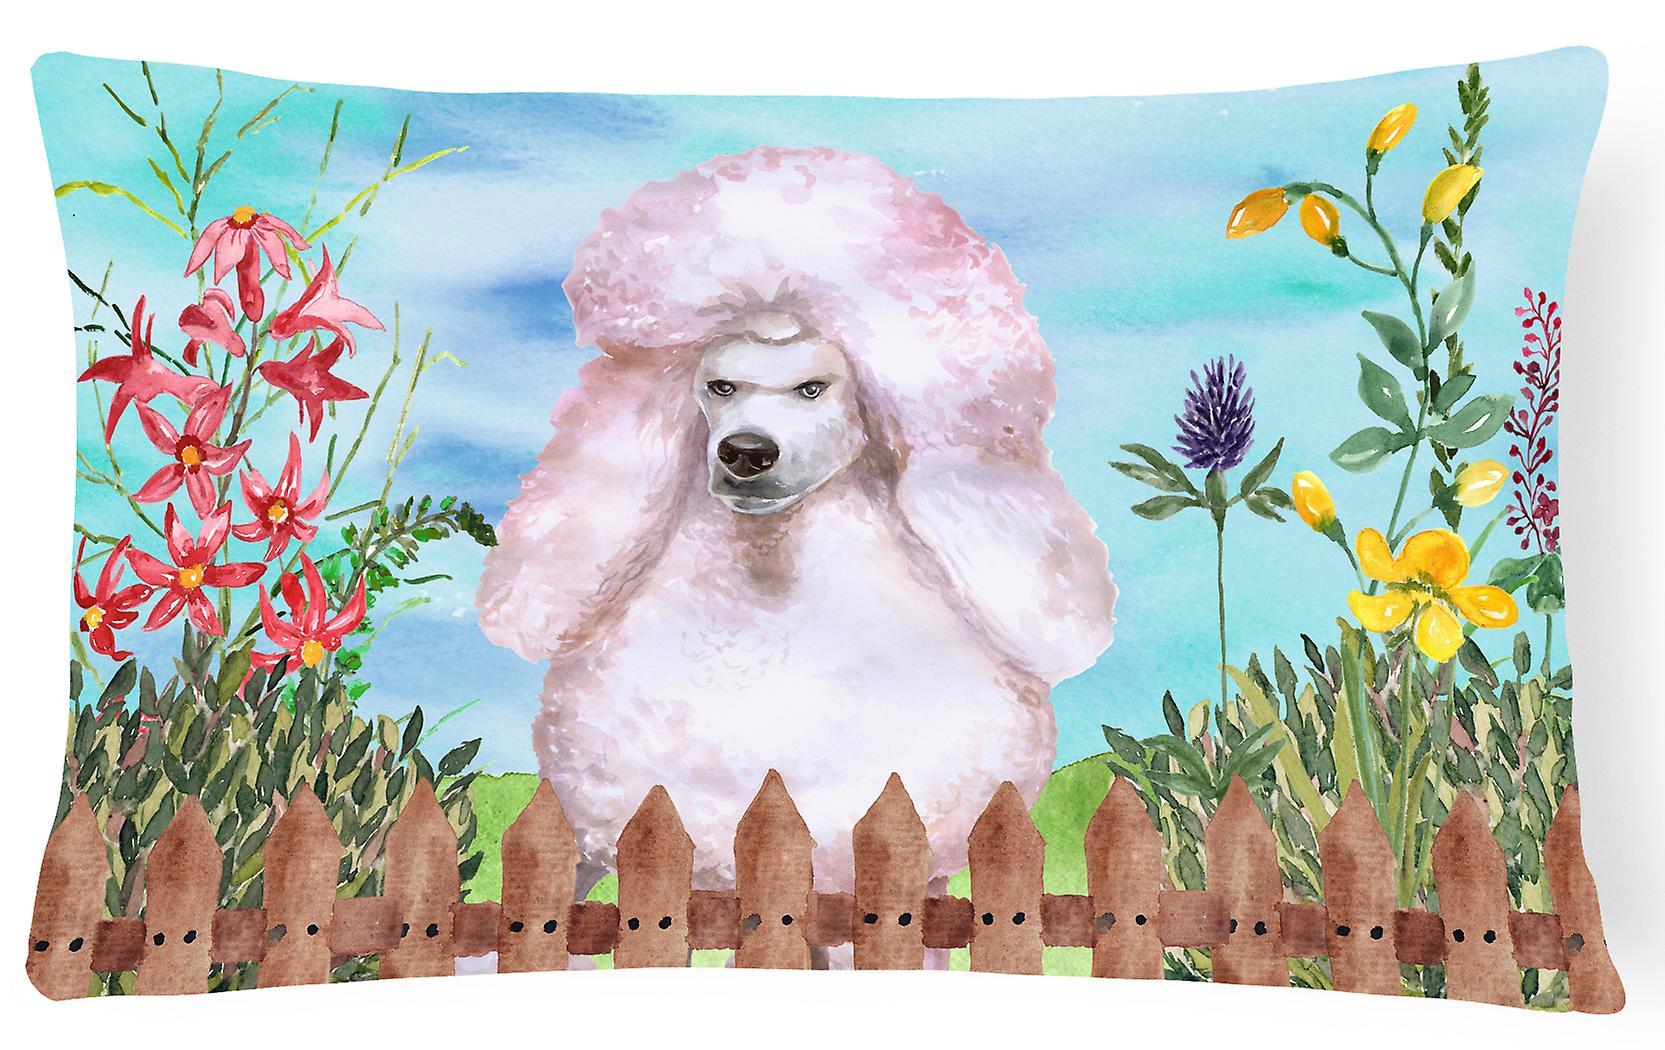 Poodle White Decorative Standard Canvas Pillow Fabric Spring 3cTlJFK1